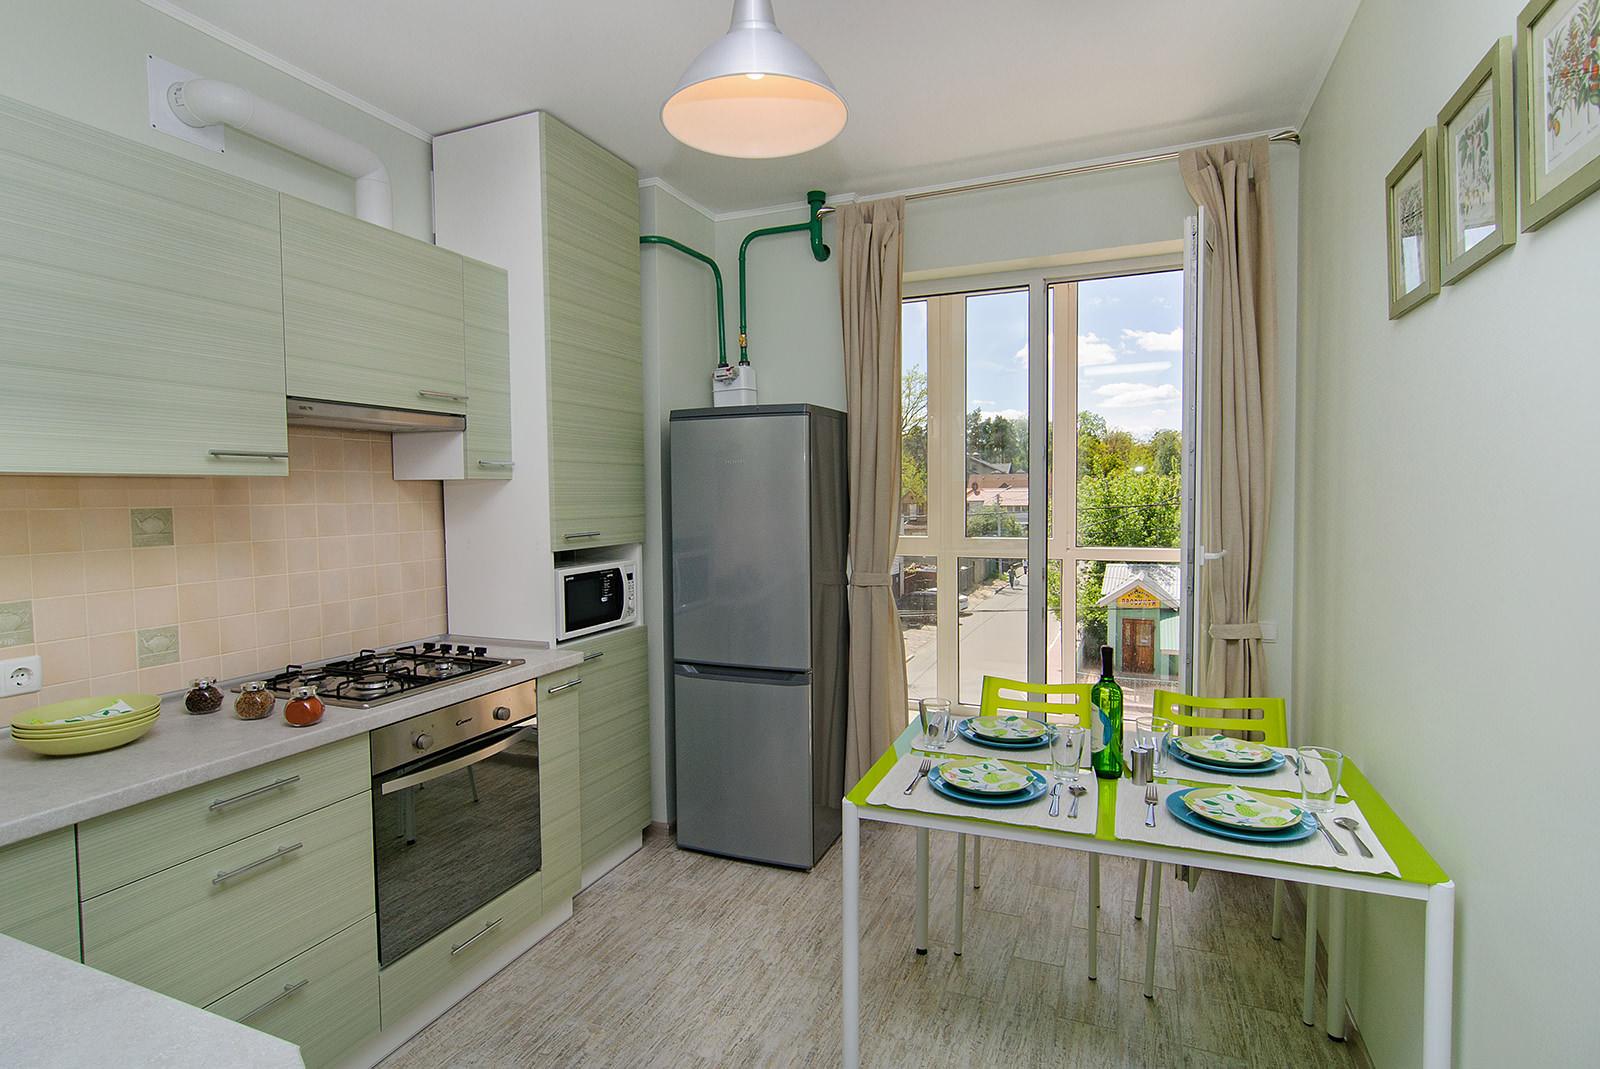 ednostaen-apartament-s-moderen-i-uiuten-interior-42-m-3g